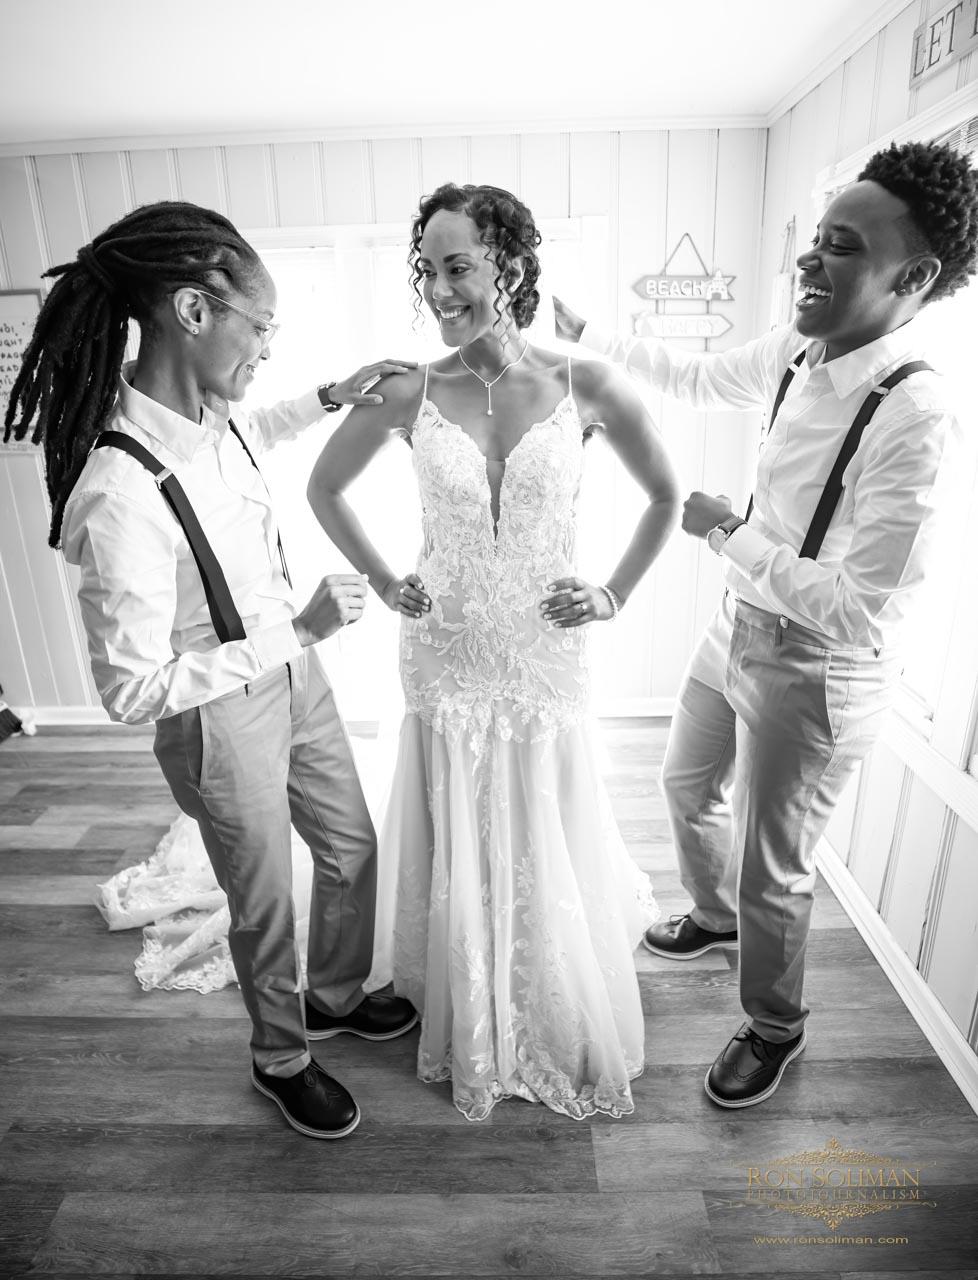 NEW JERSEY BEACH WEDDING 8